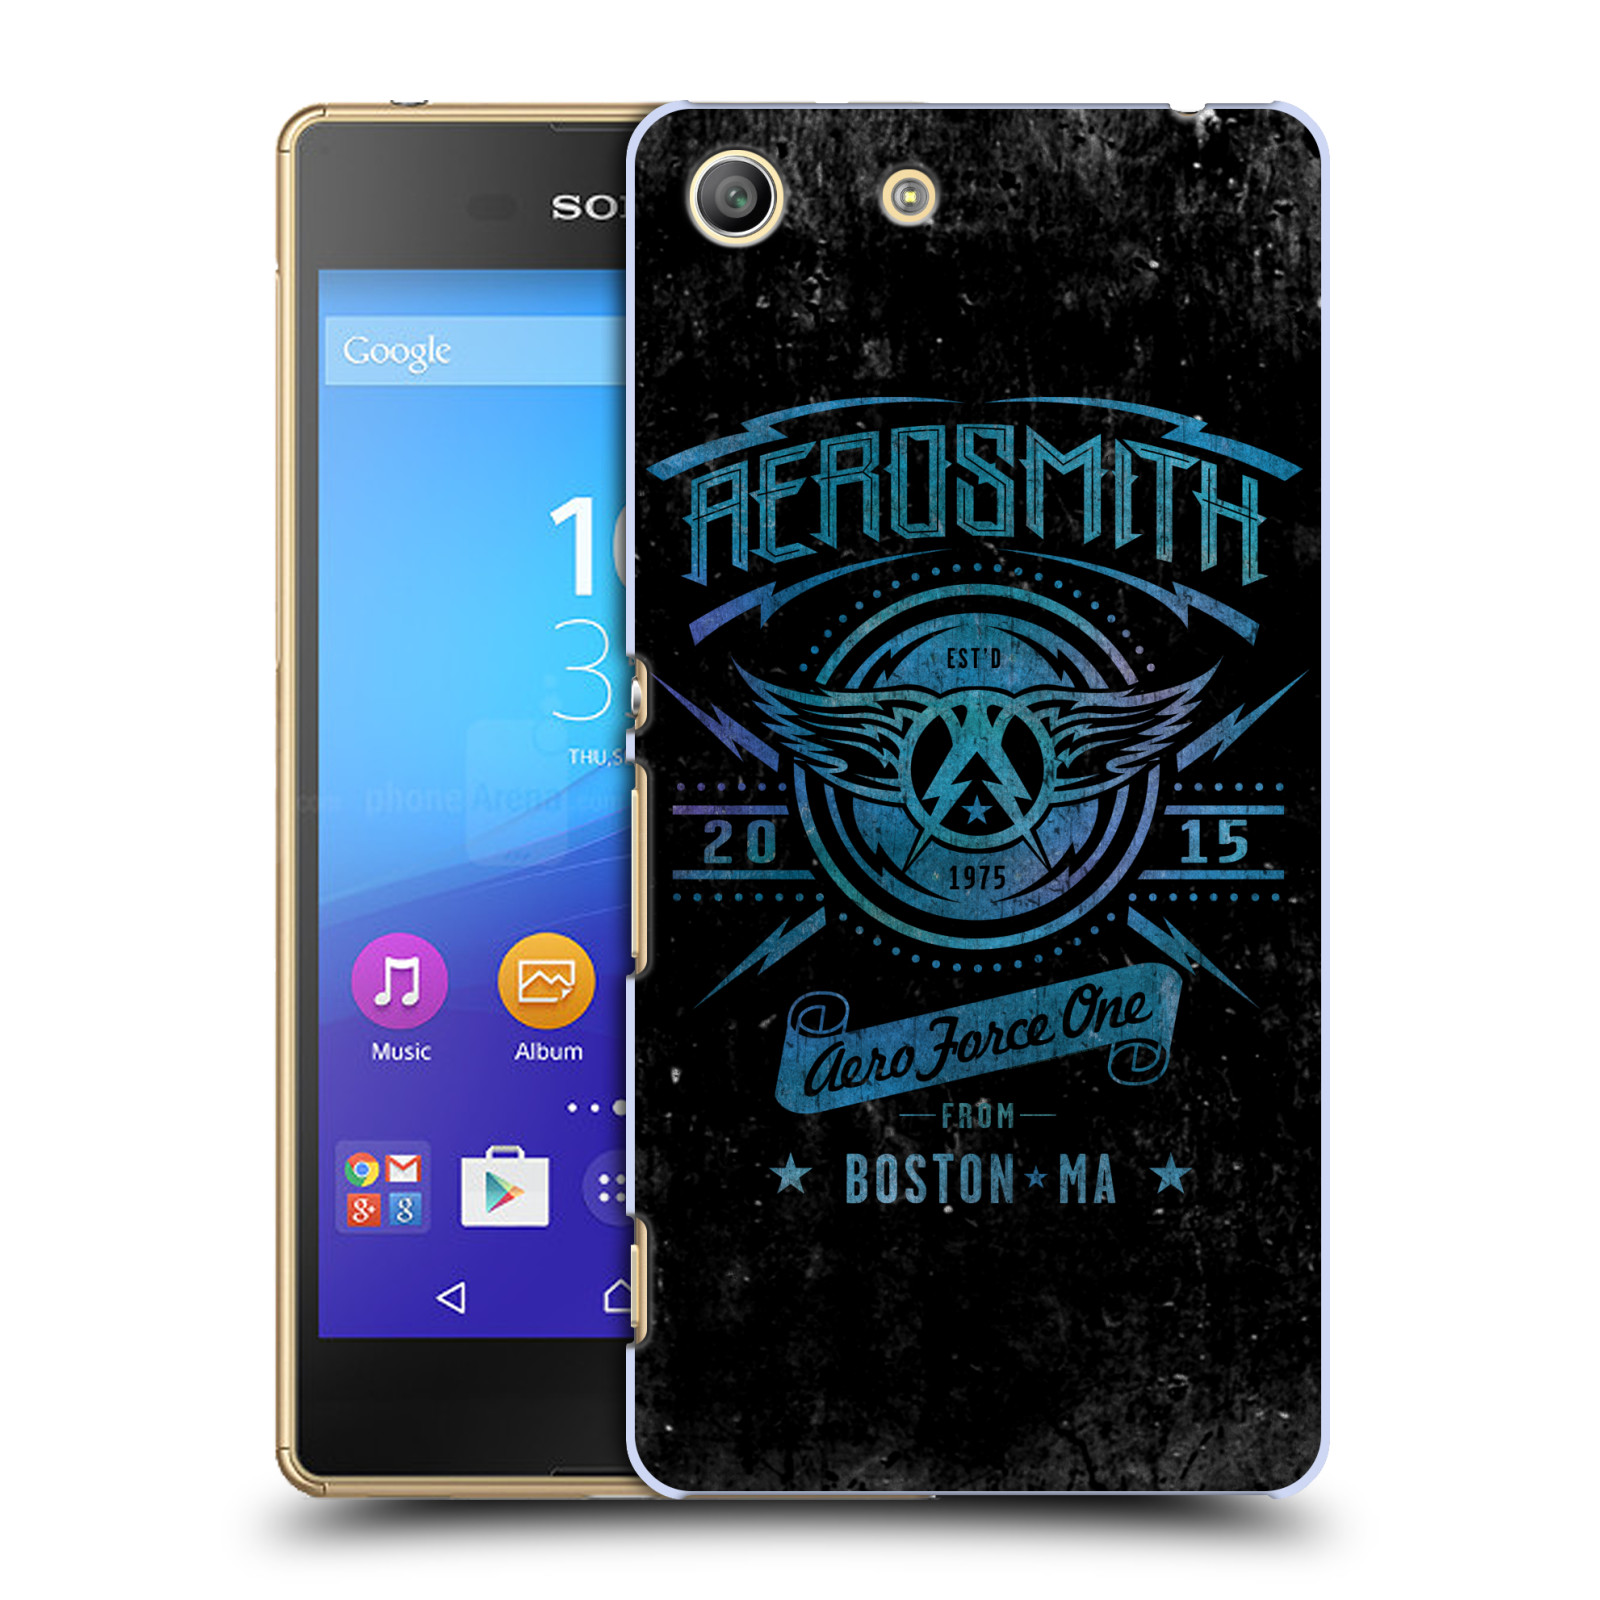 Plastové pouzdro na mobil Sony Xperia M5 HEAD CASE - Aerosmith - Aero Force One